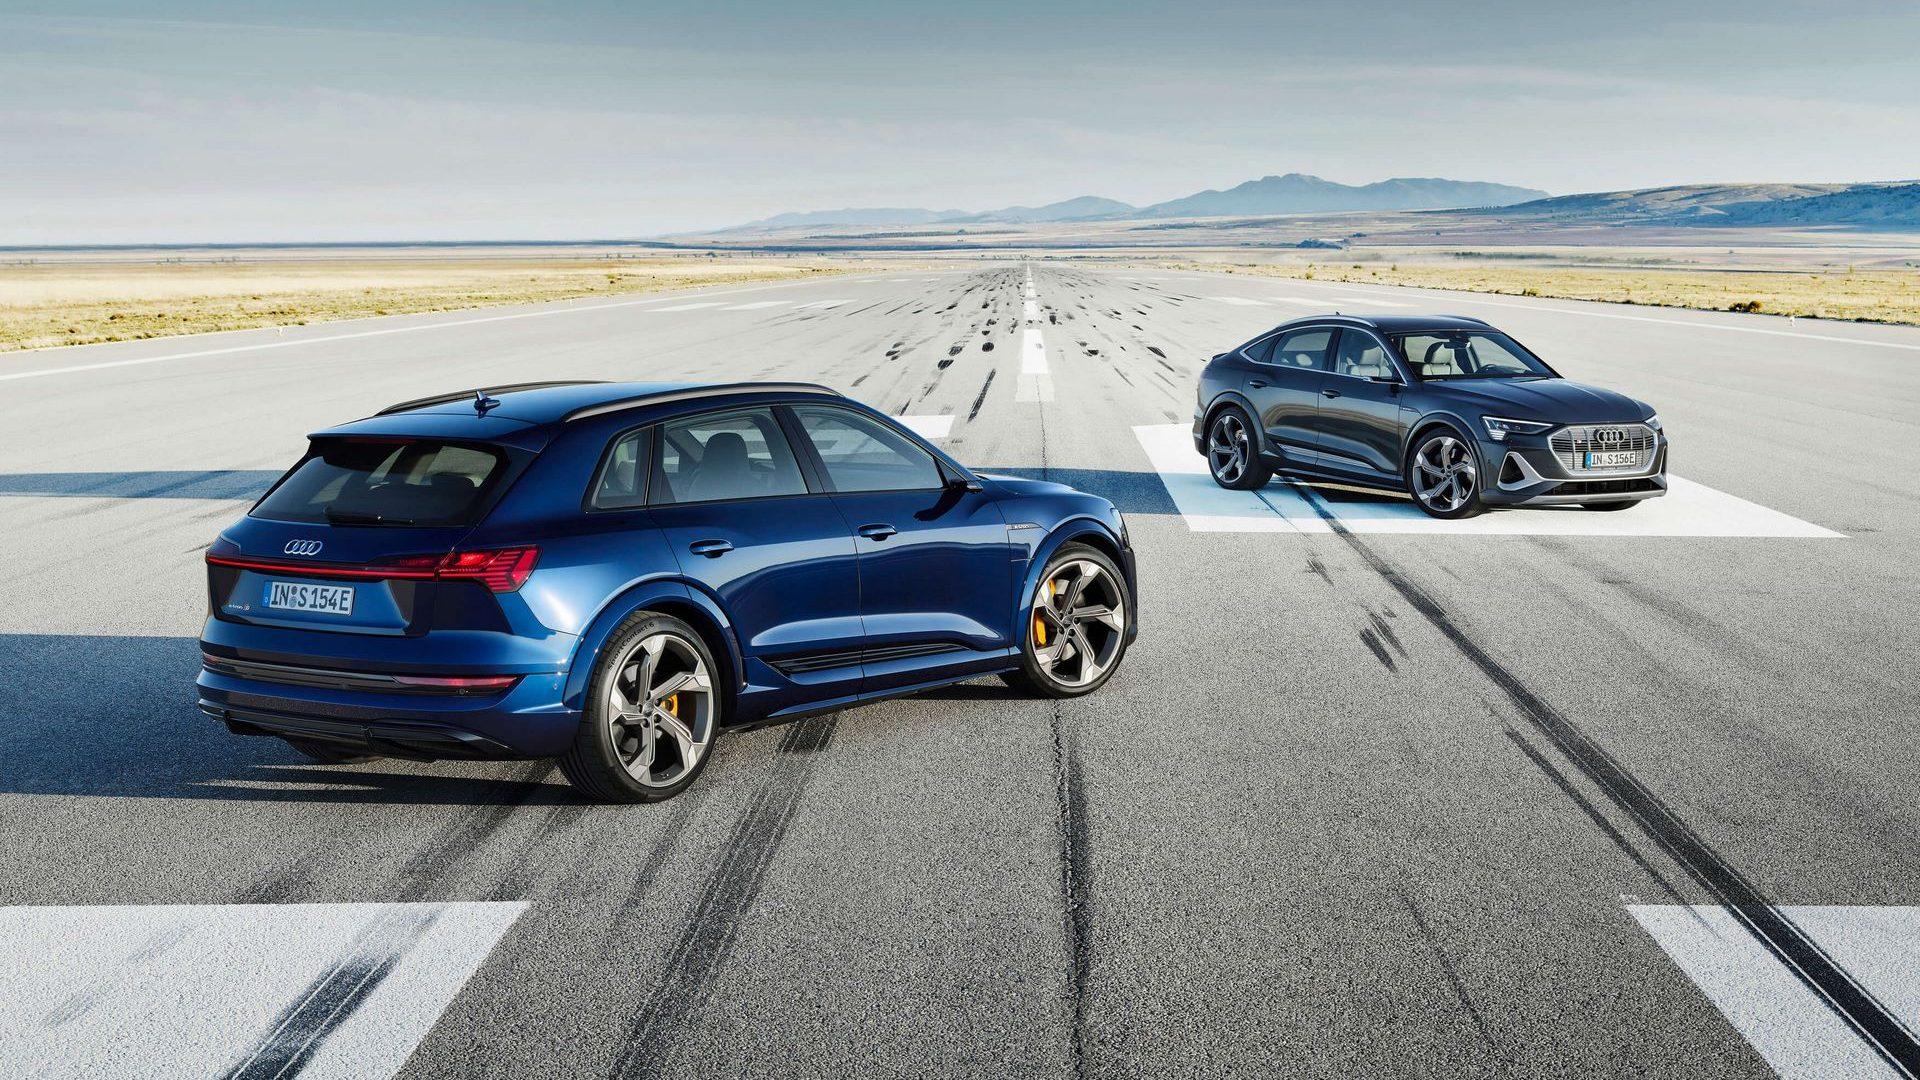 Audi-E-Tron-S-and-E-Tron-S-Sportback-2020-1-e1593617353118